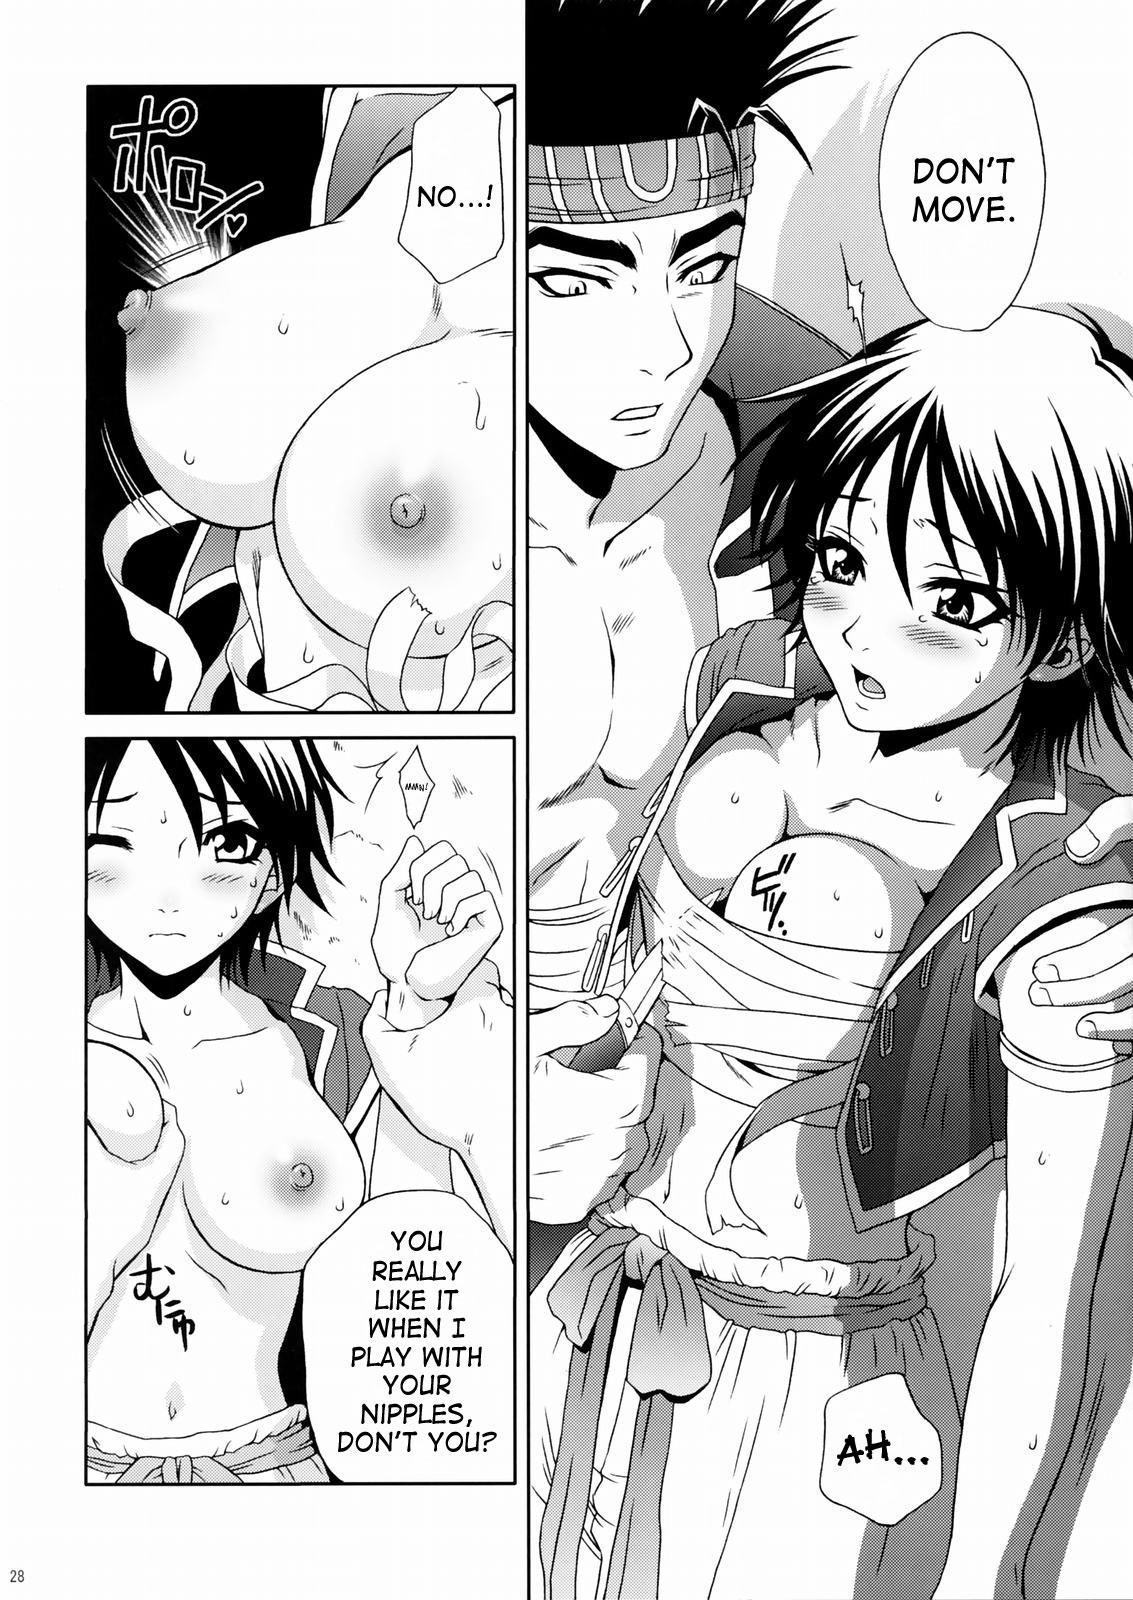 (C66) [U.R.C (Momoya Show-Neko)] Rikuson-chan ~Lovely Gunshi no Himitsu~ | Rikuson-chan Secret of The Lovely Strategist (Dynasty Warriors) [English] [SaHa] 26